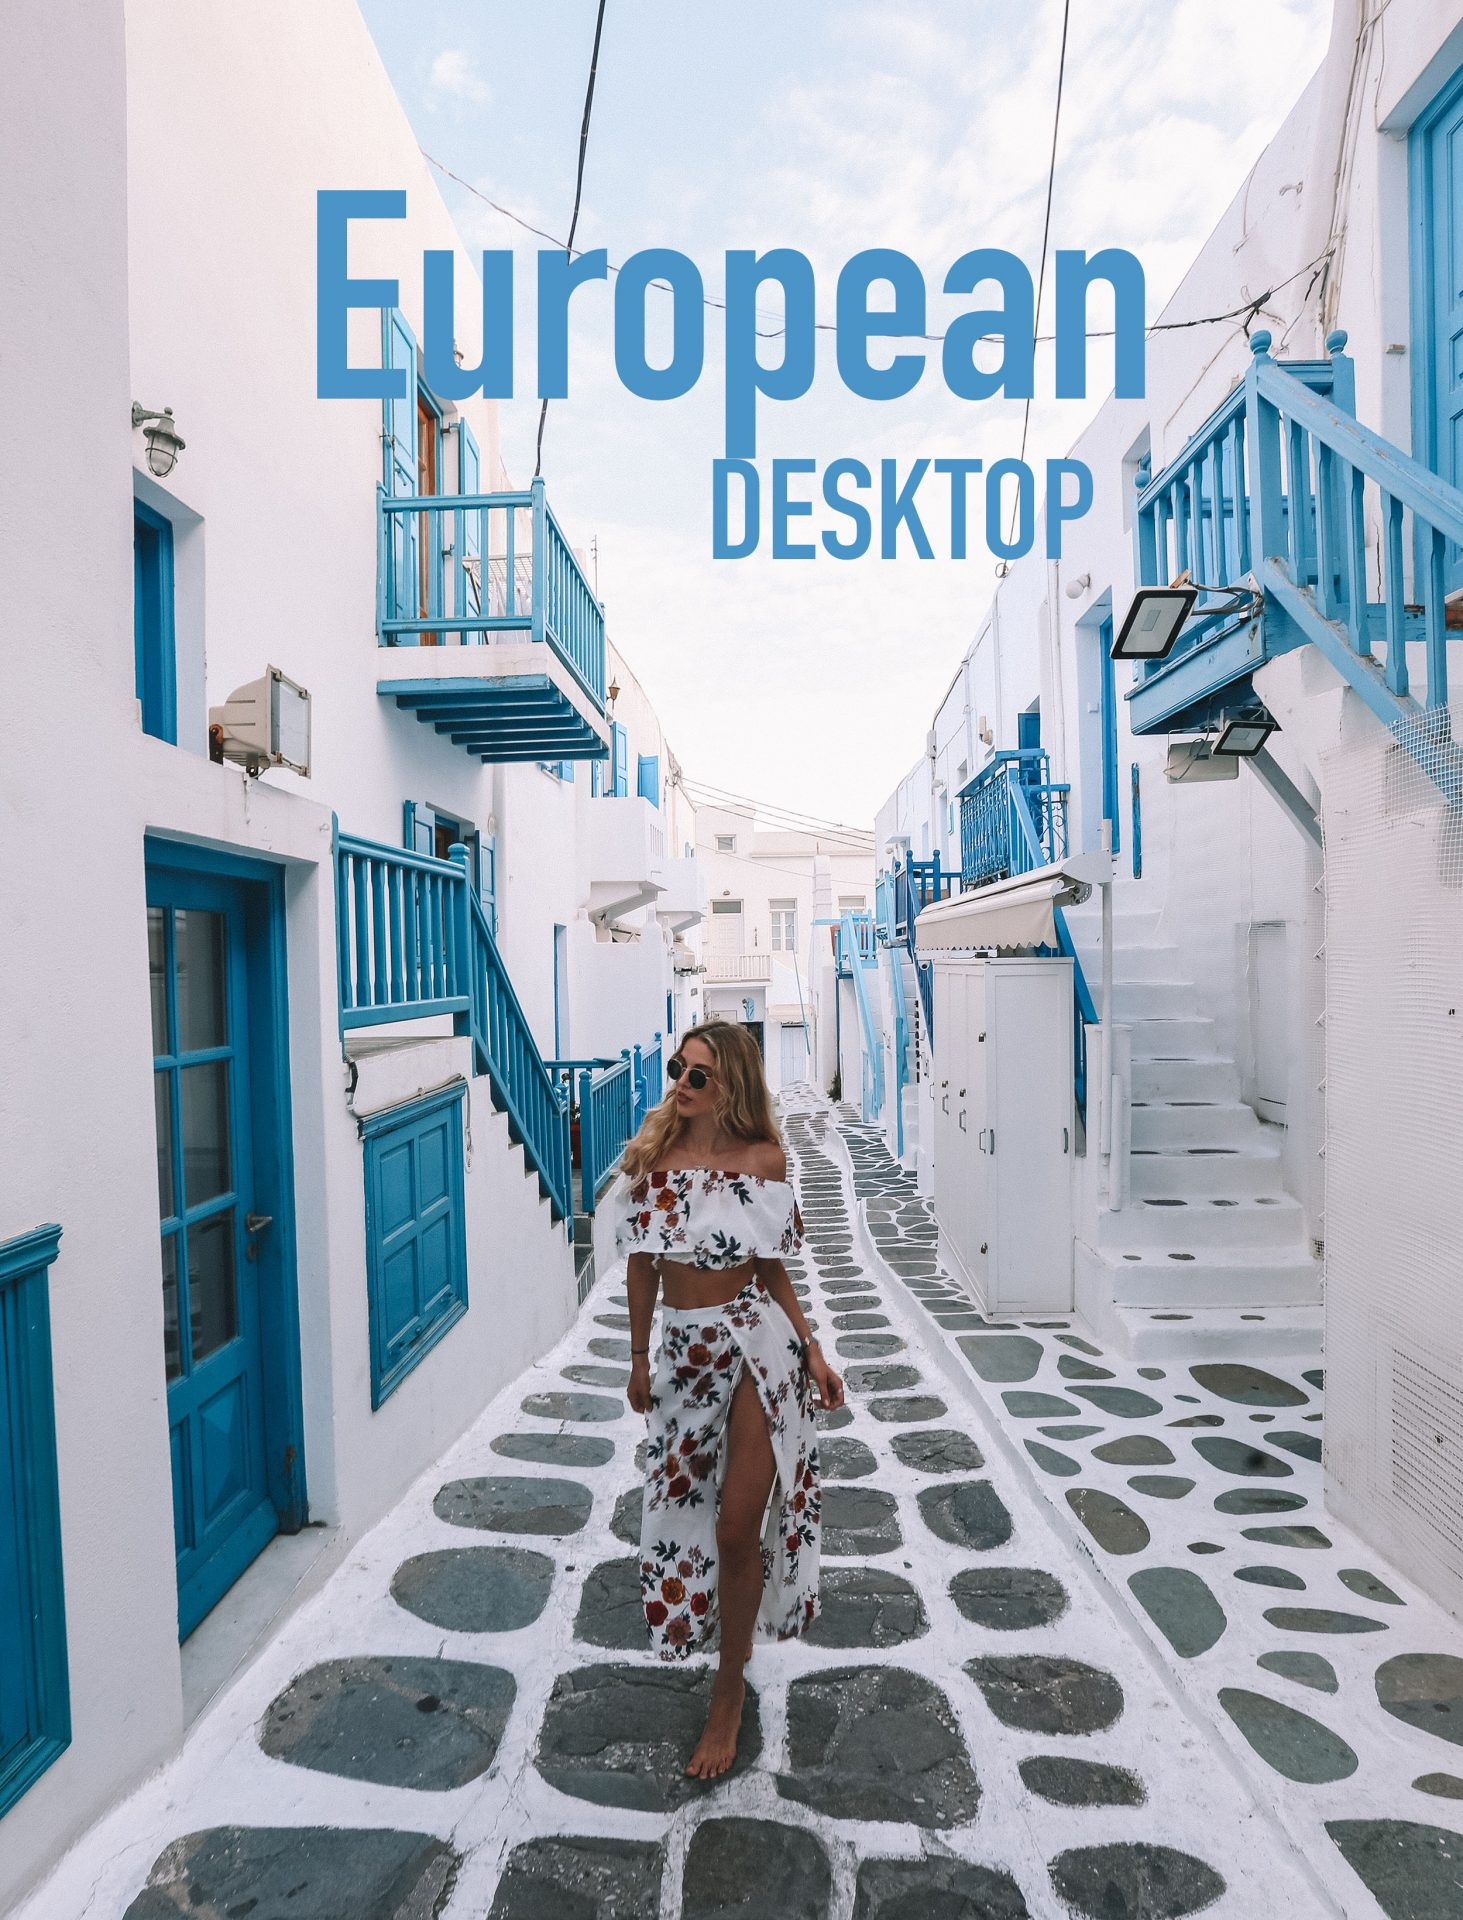 European Desktop - Meryl Denis Presets